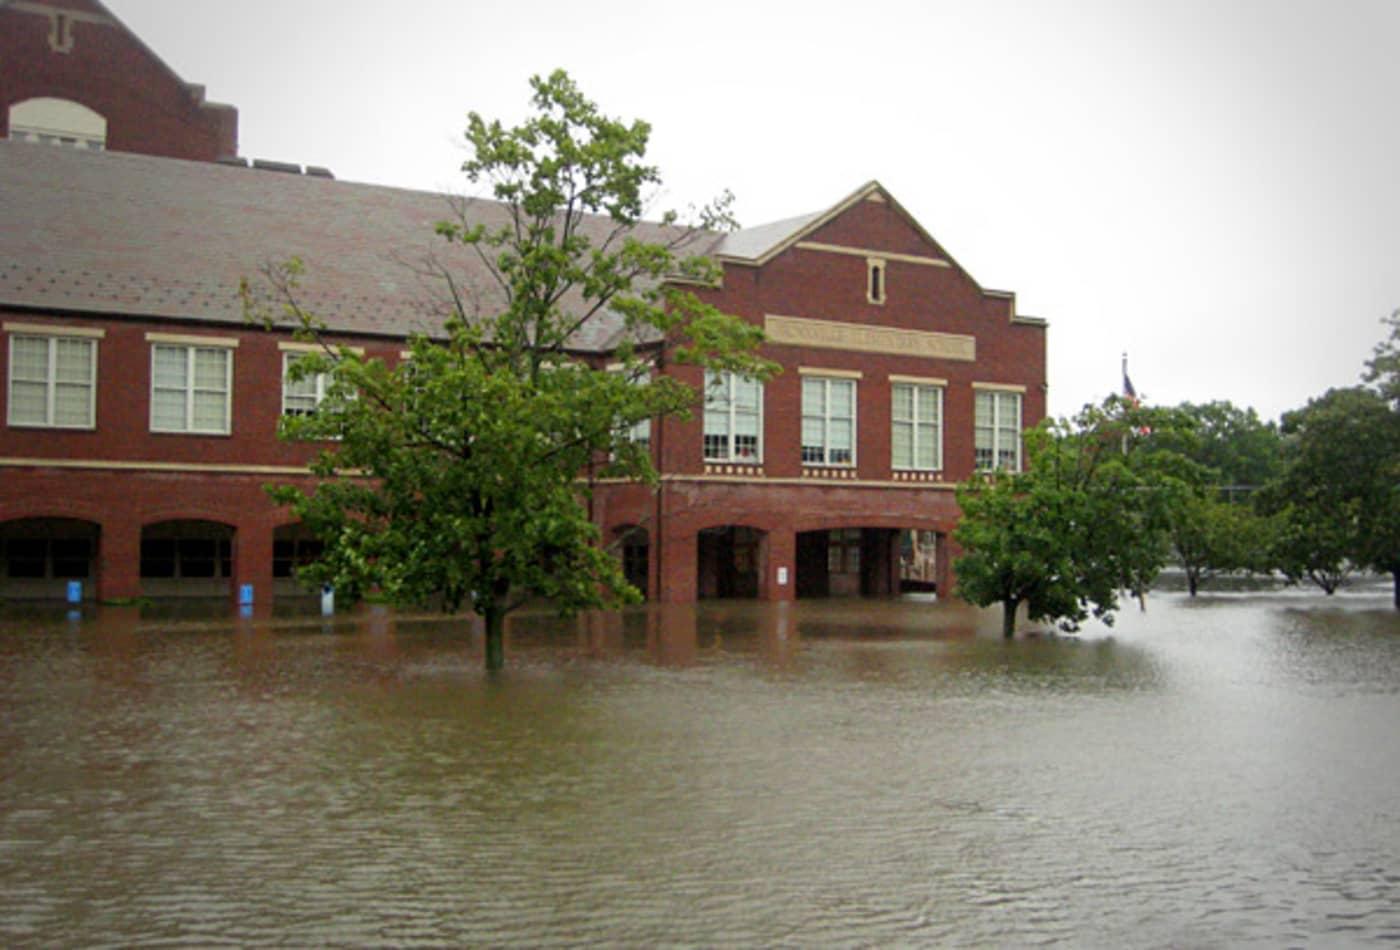 Irene_AUG28_bronxville_ny_elementary_school.jpg